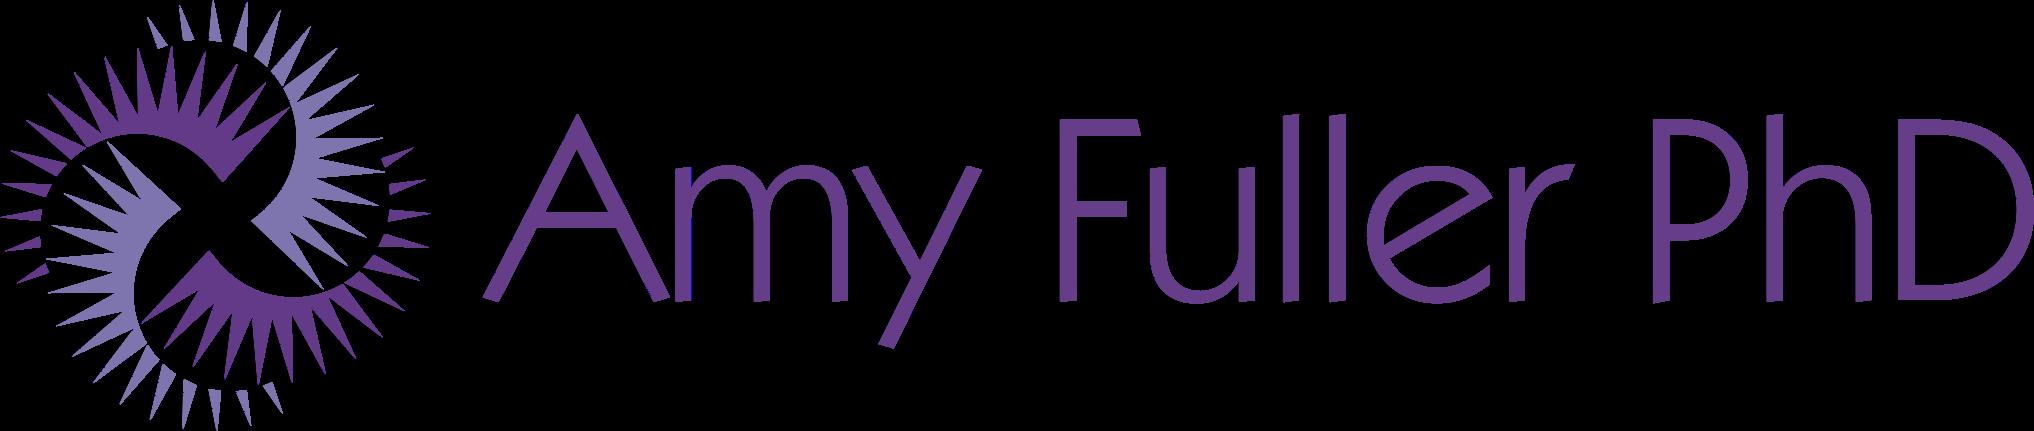 Amy Fuller PhD